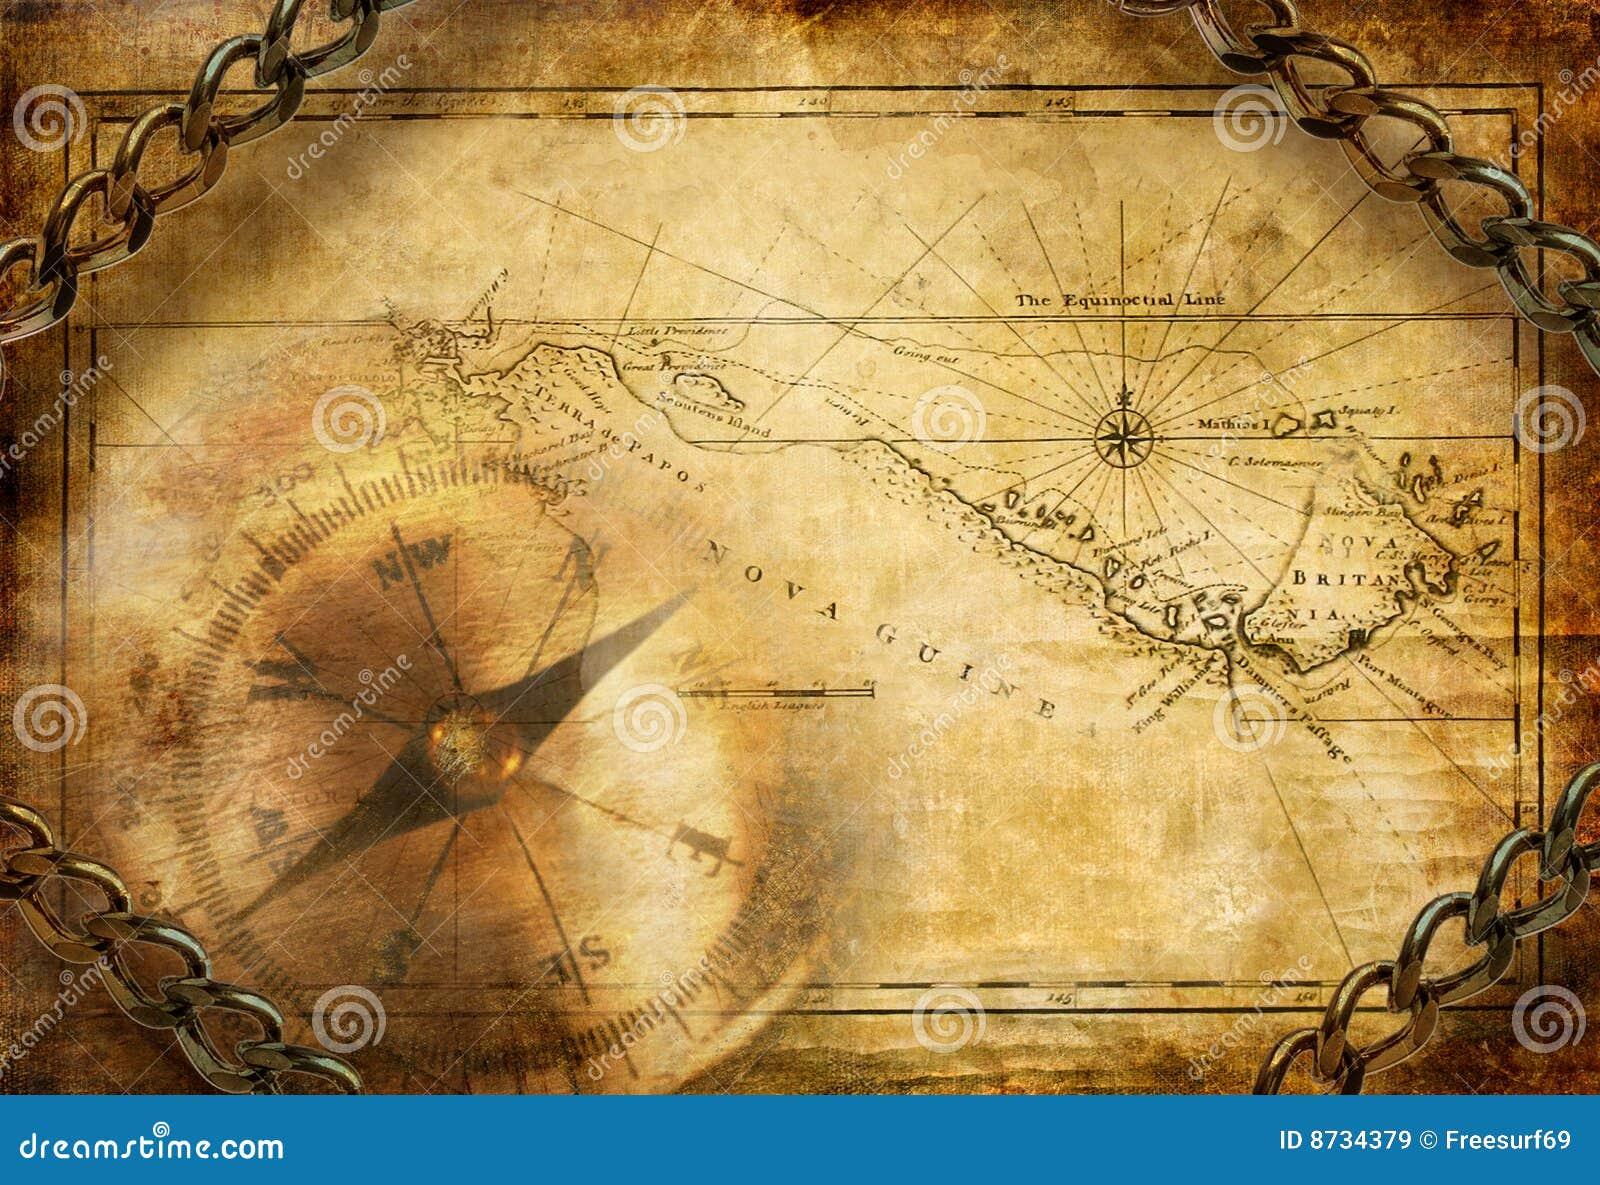 ancient global map royalty - photo #31